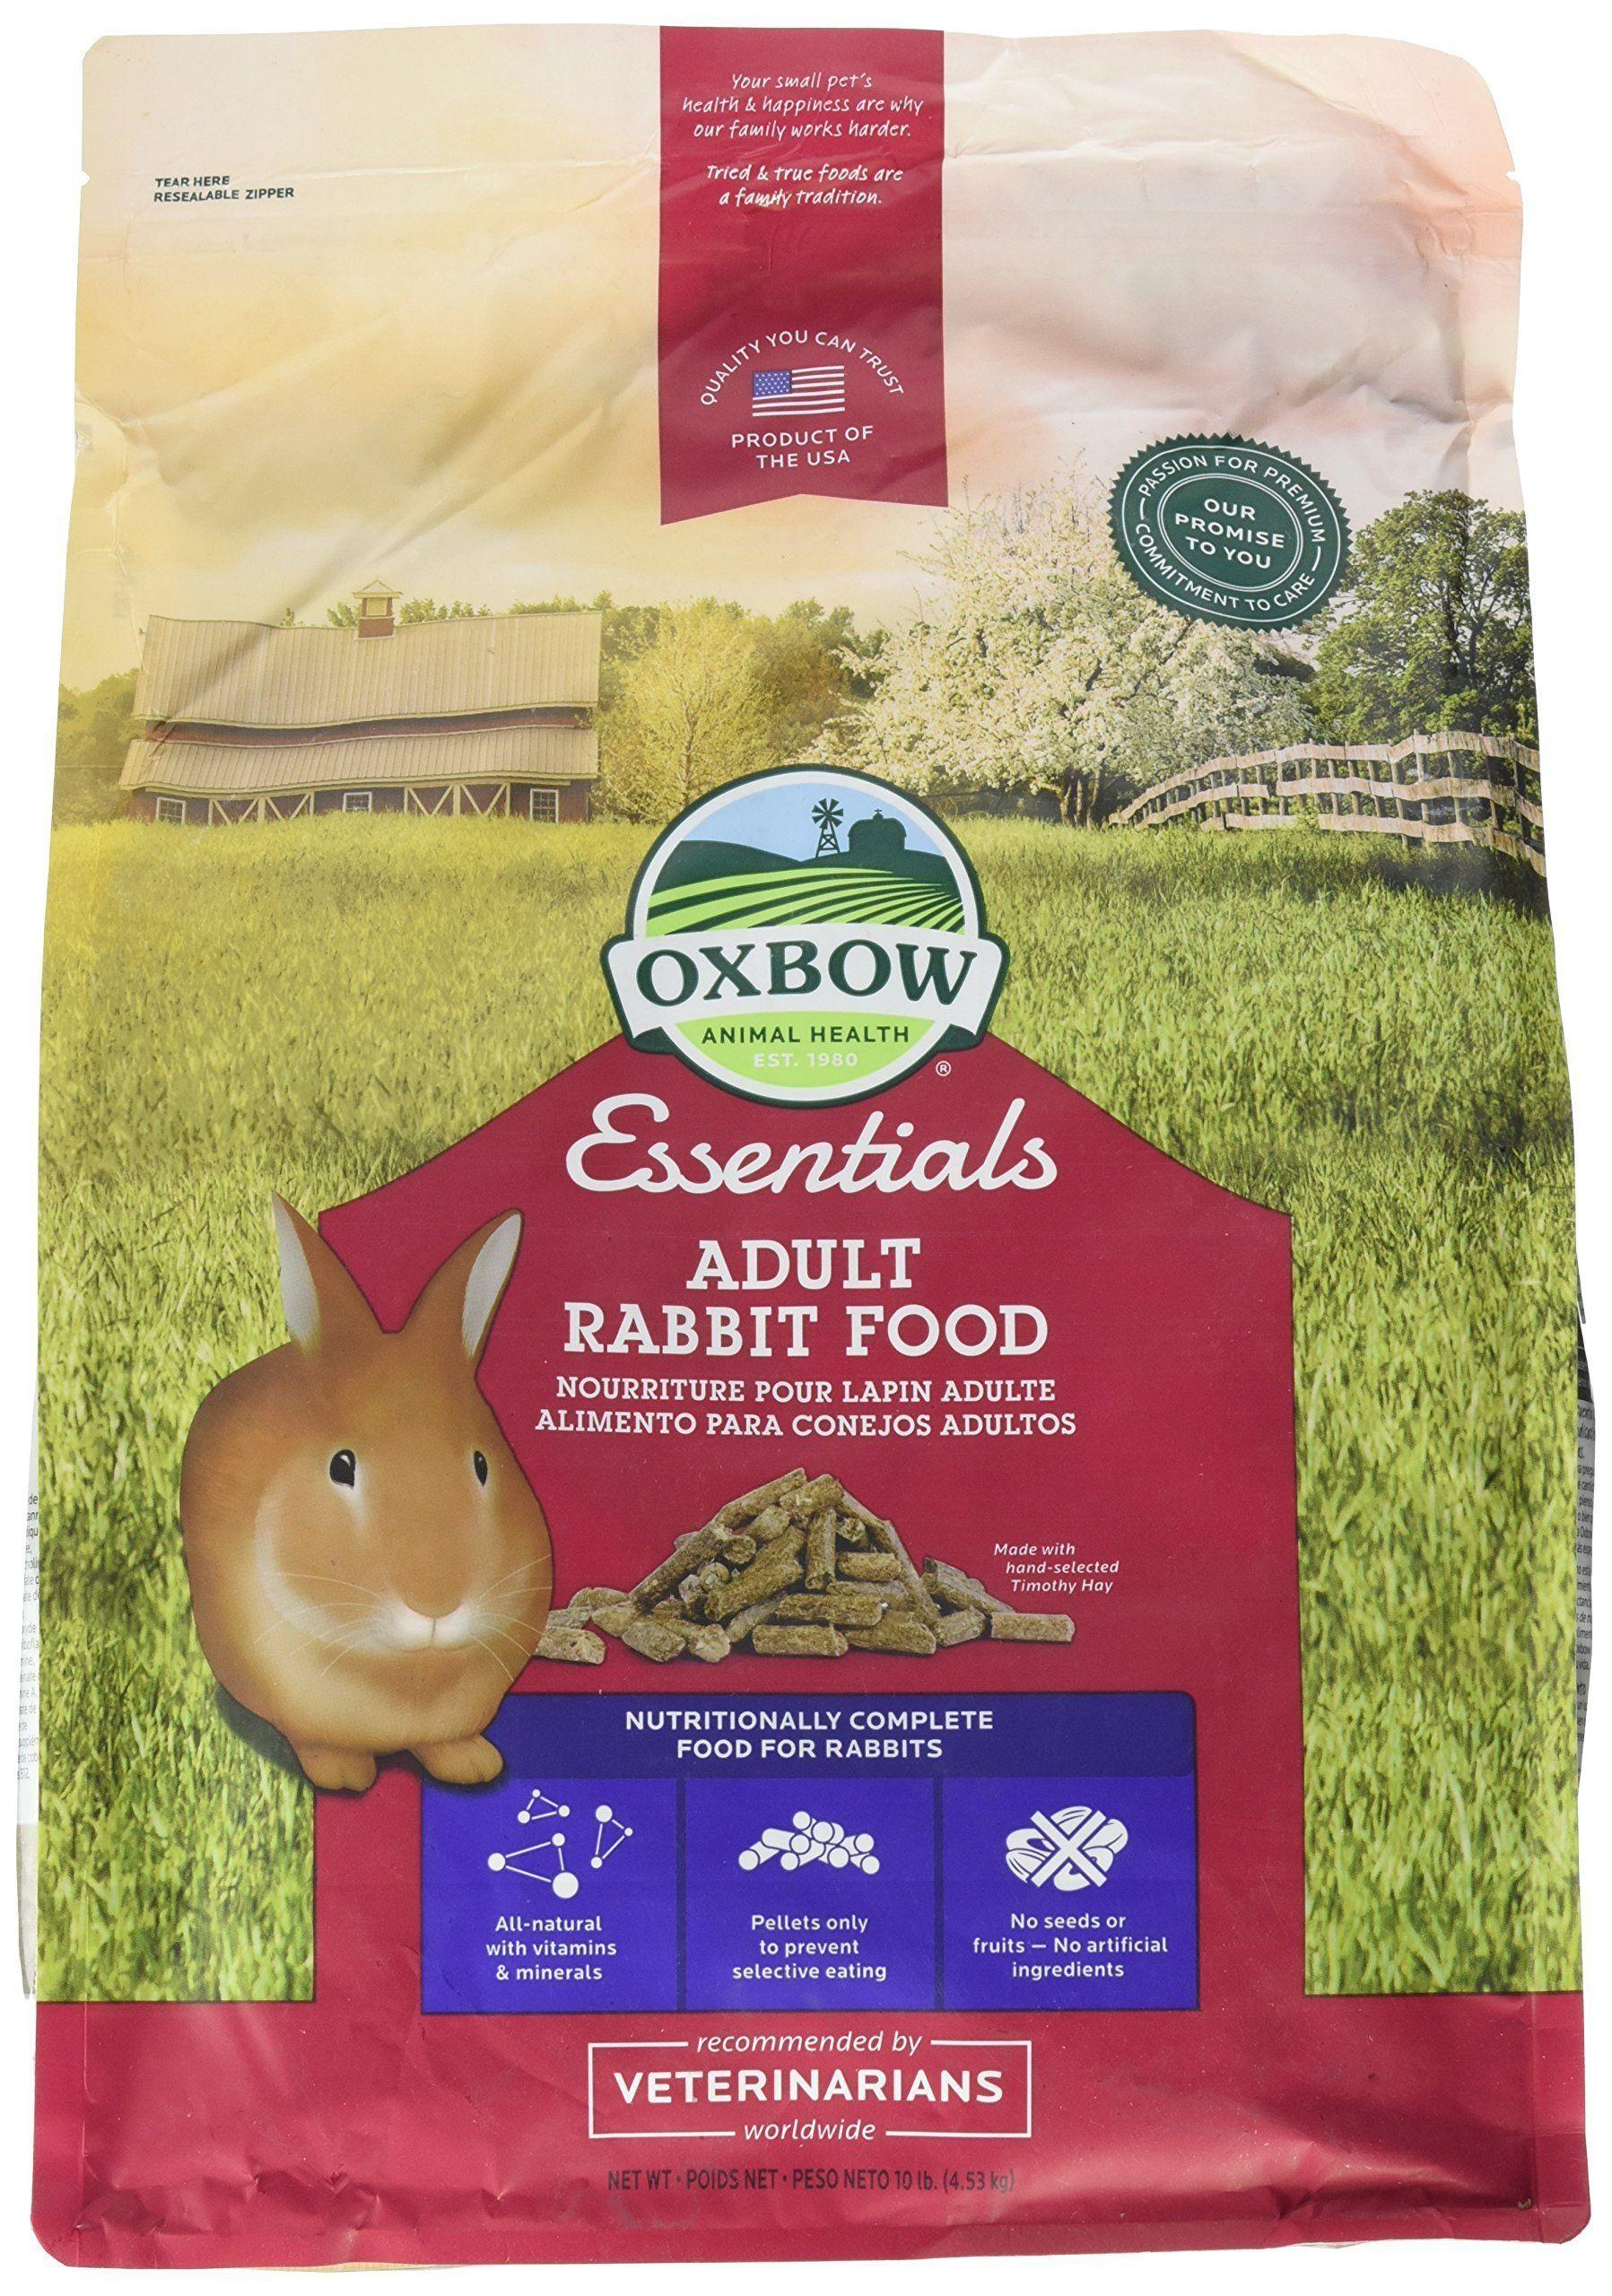 Oxbow animal health bunny basics essentials adult rabbit